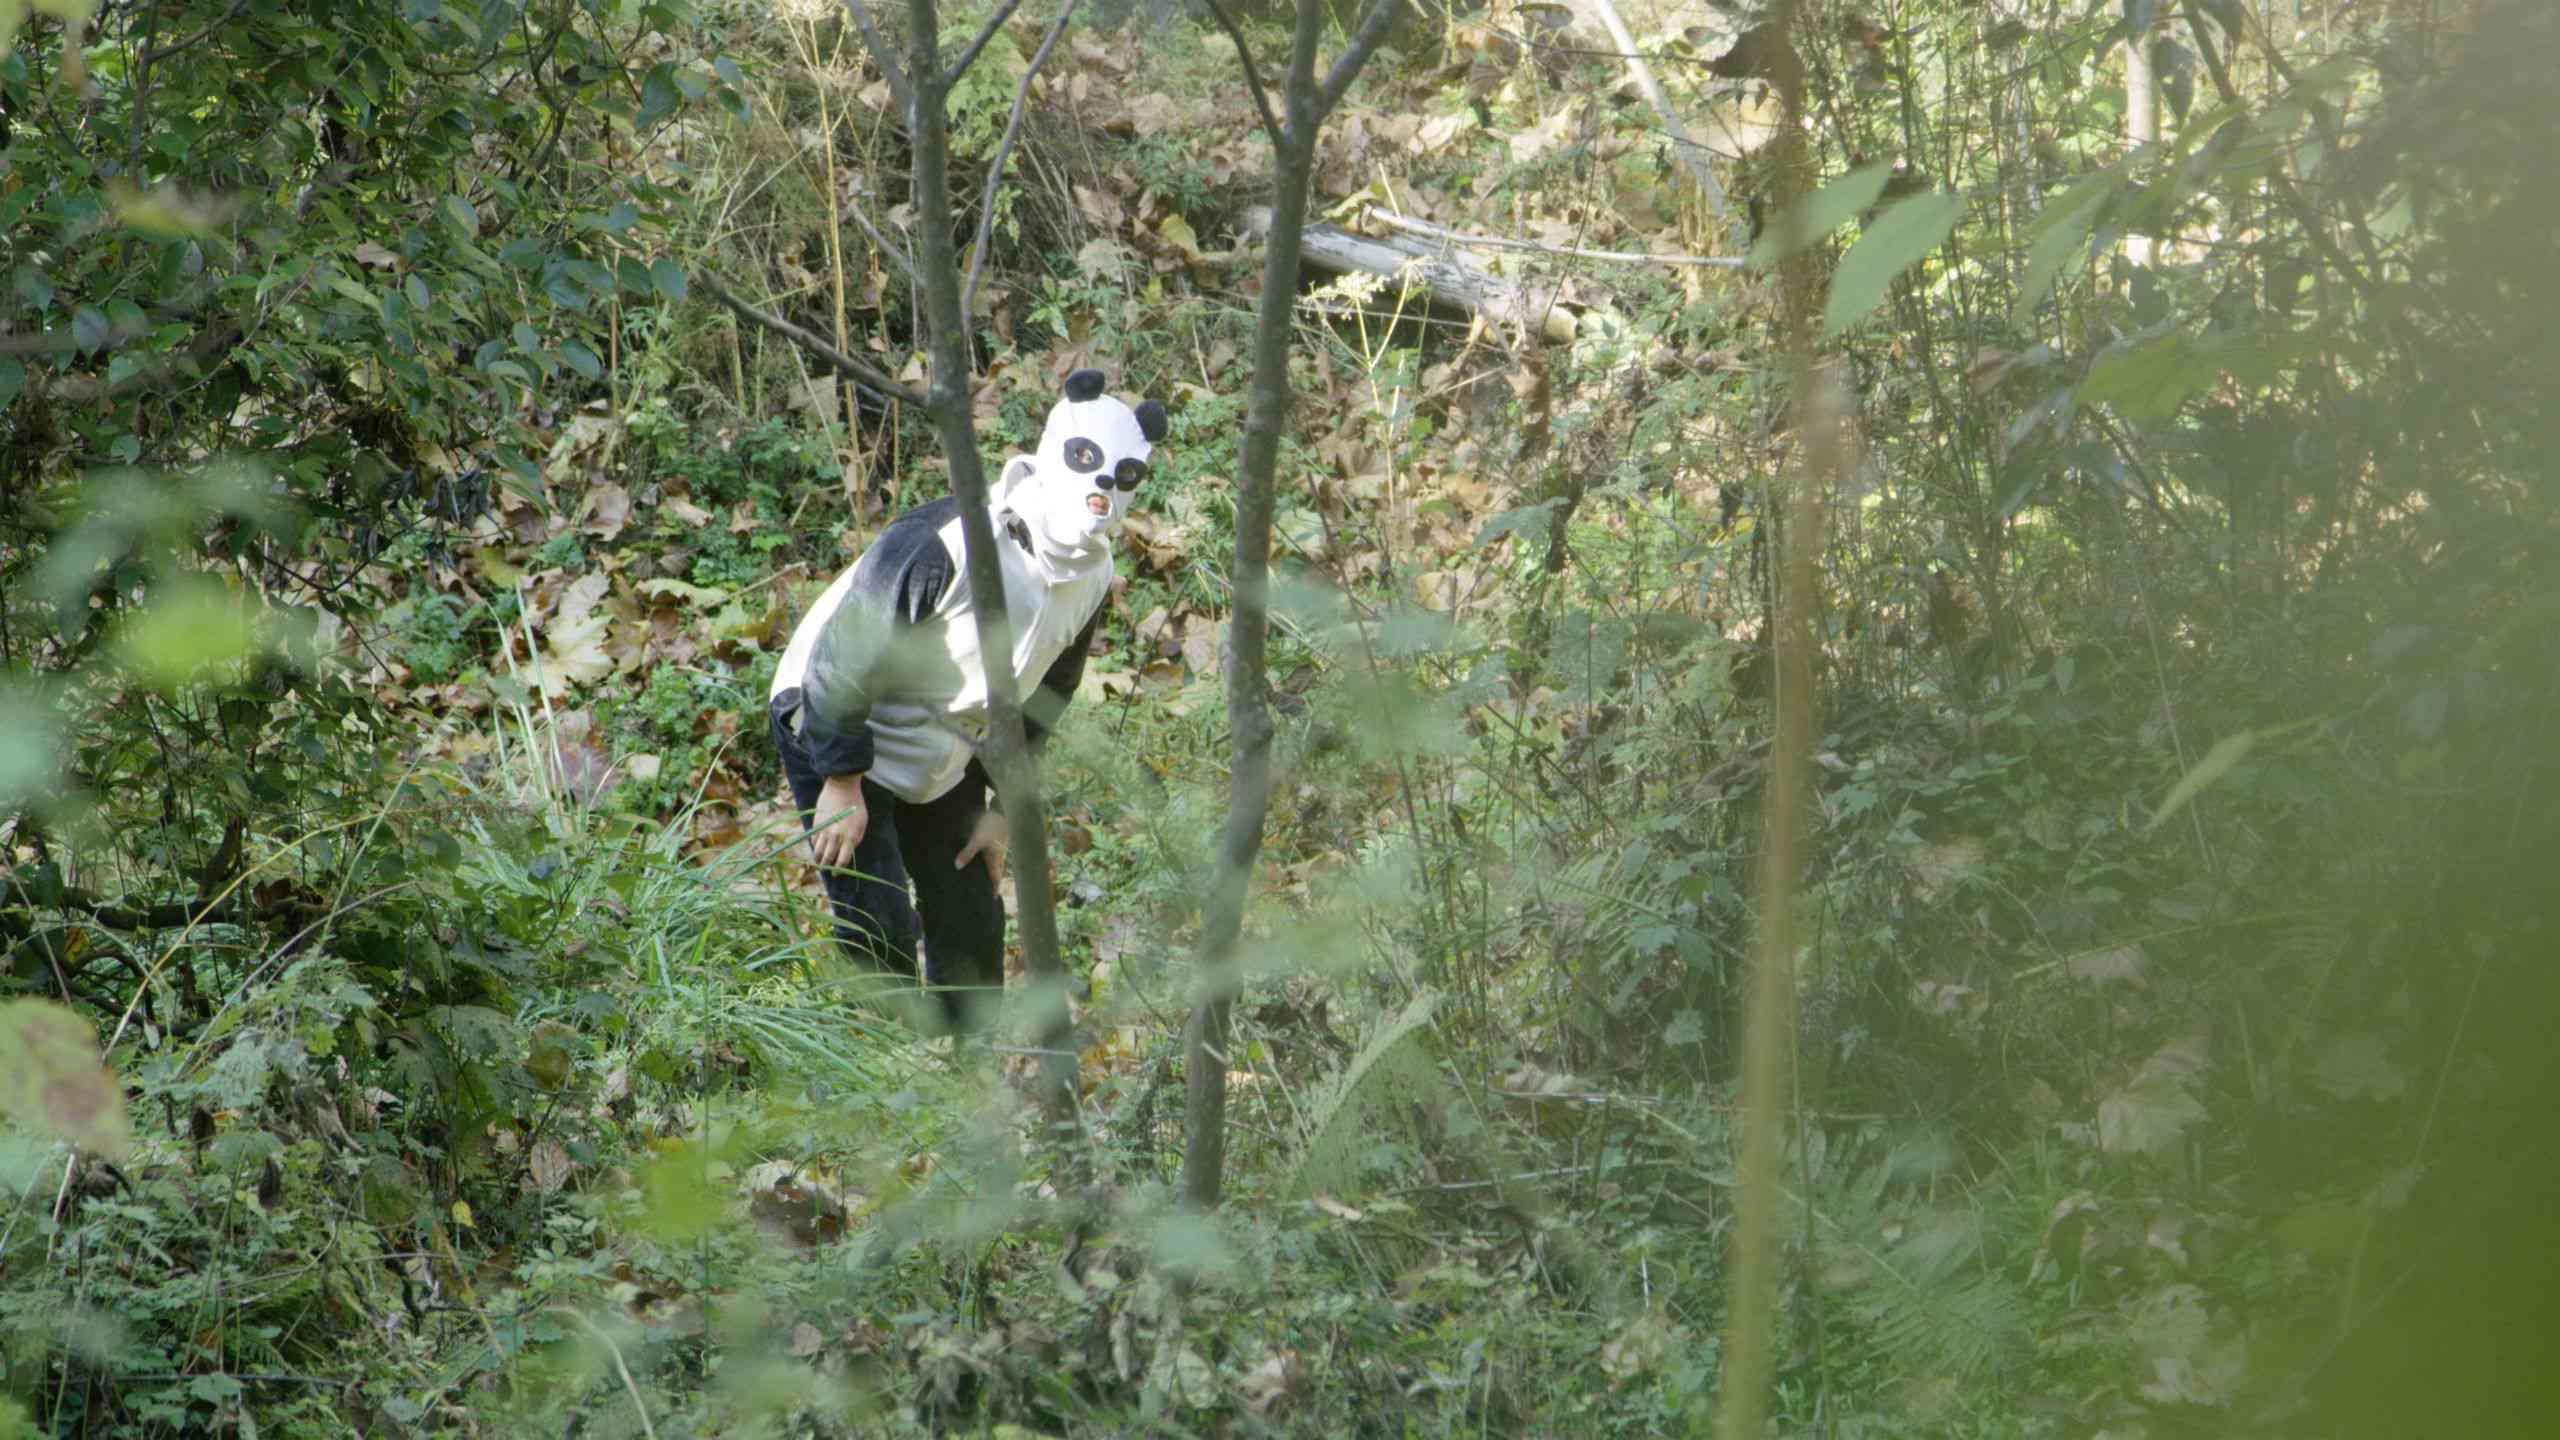 keeper disguised as a panda